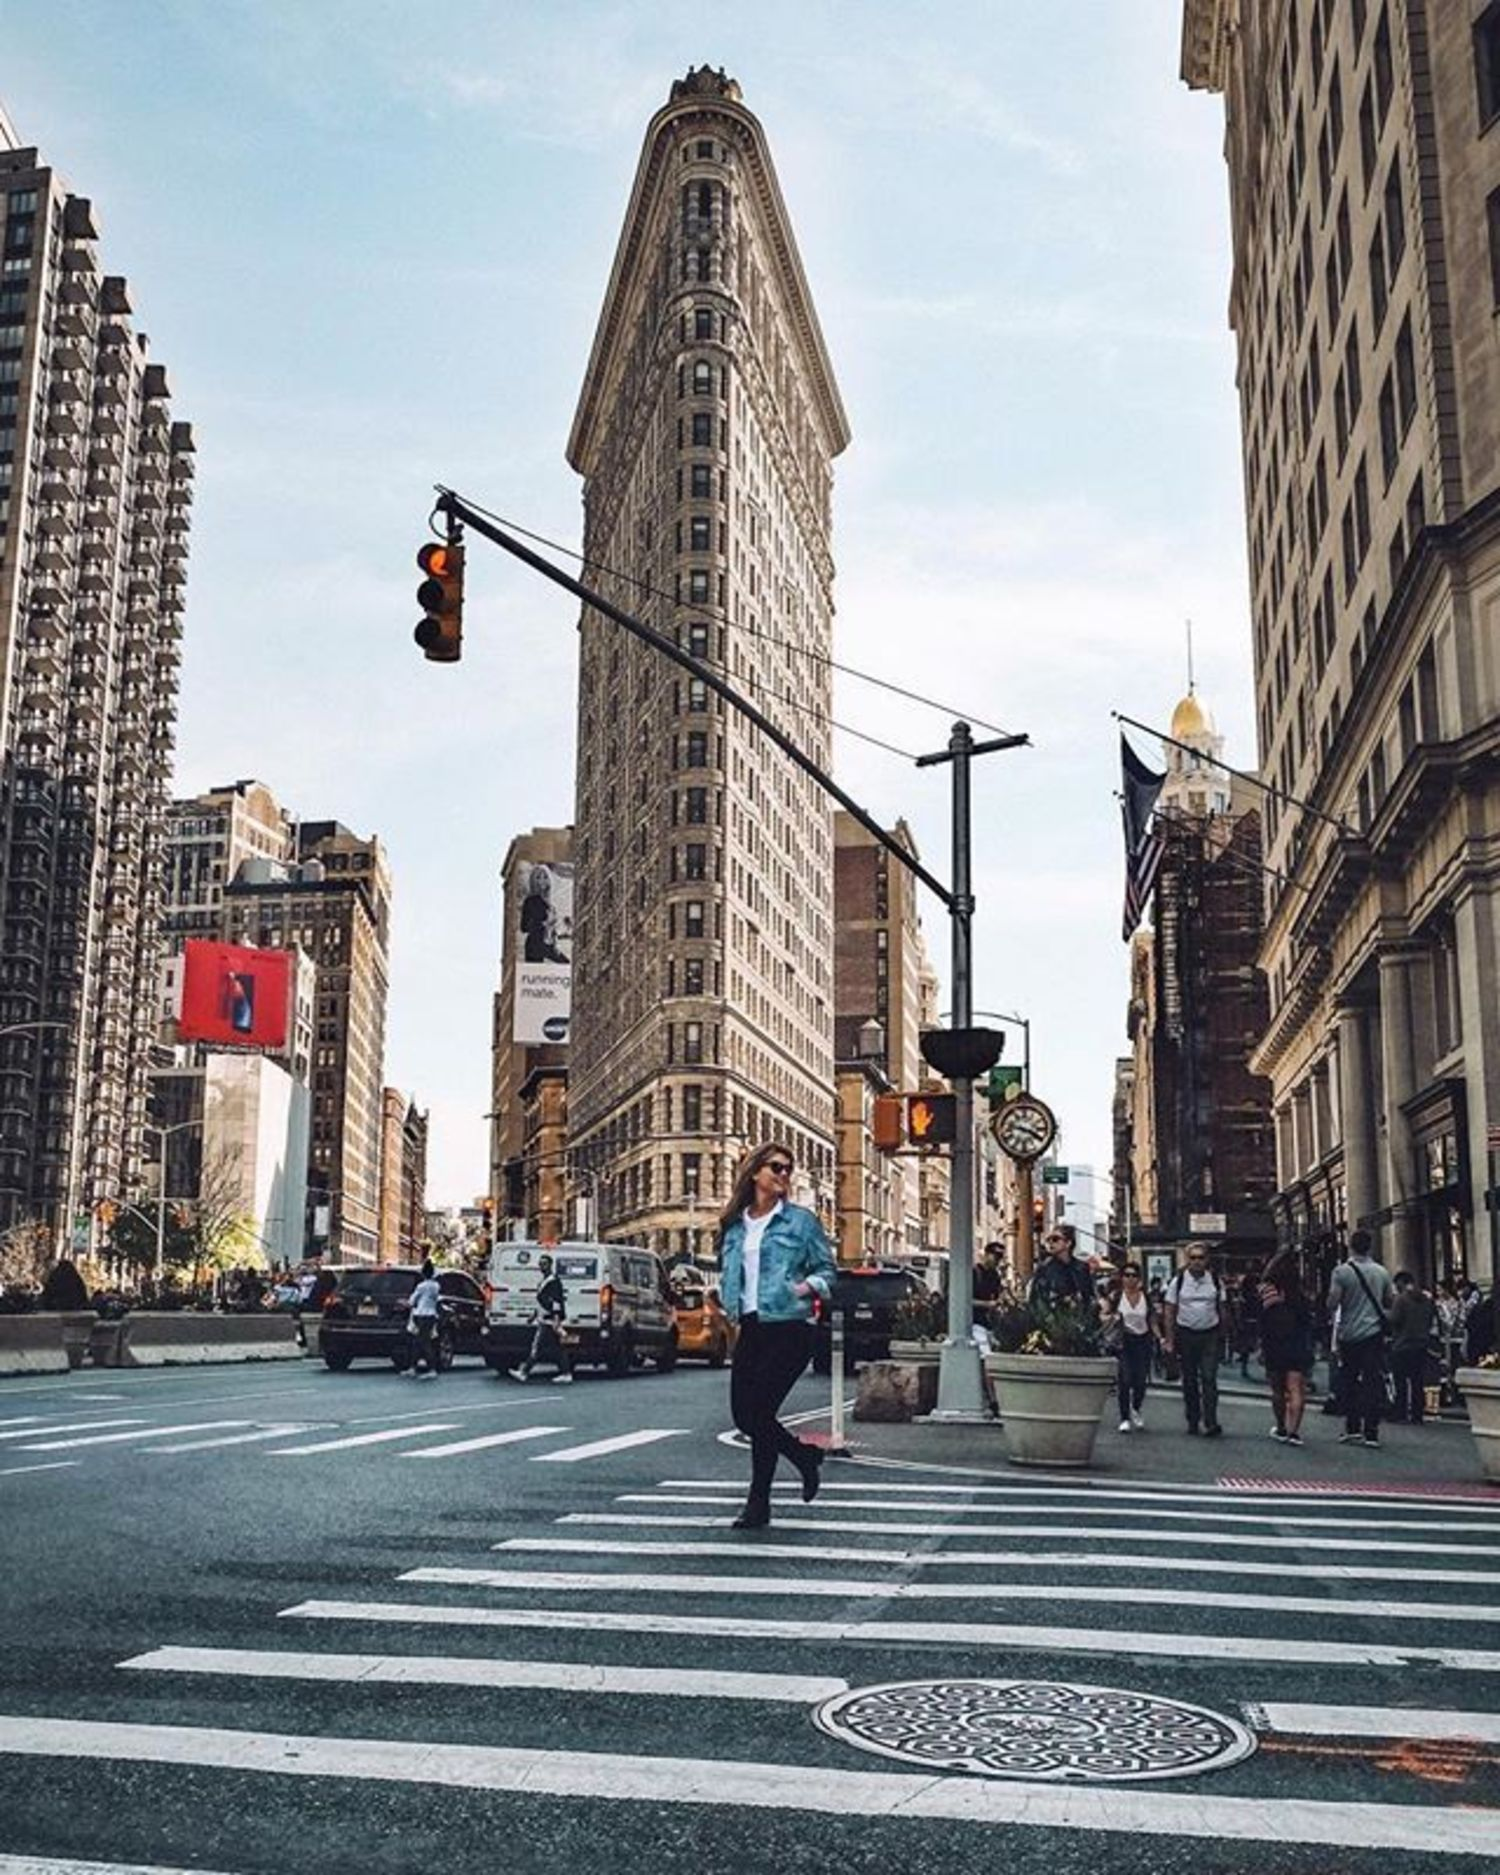 Flatiron Building, New York, New York. Photo via @tailsofamermaid #viewingnyc #newyork #newyorkcity #nyc #flatiron